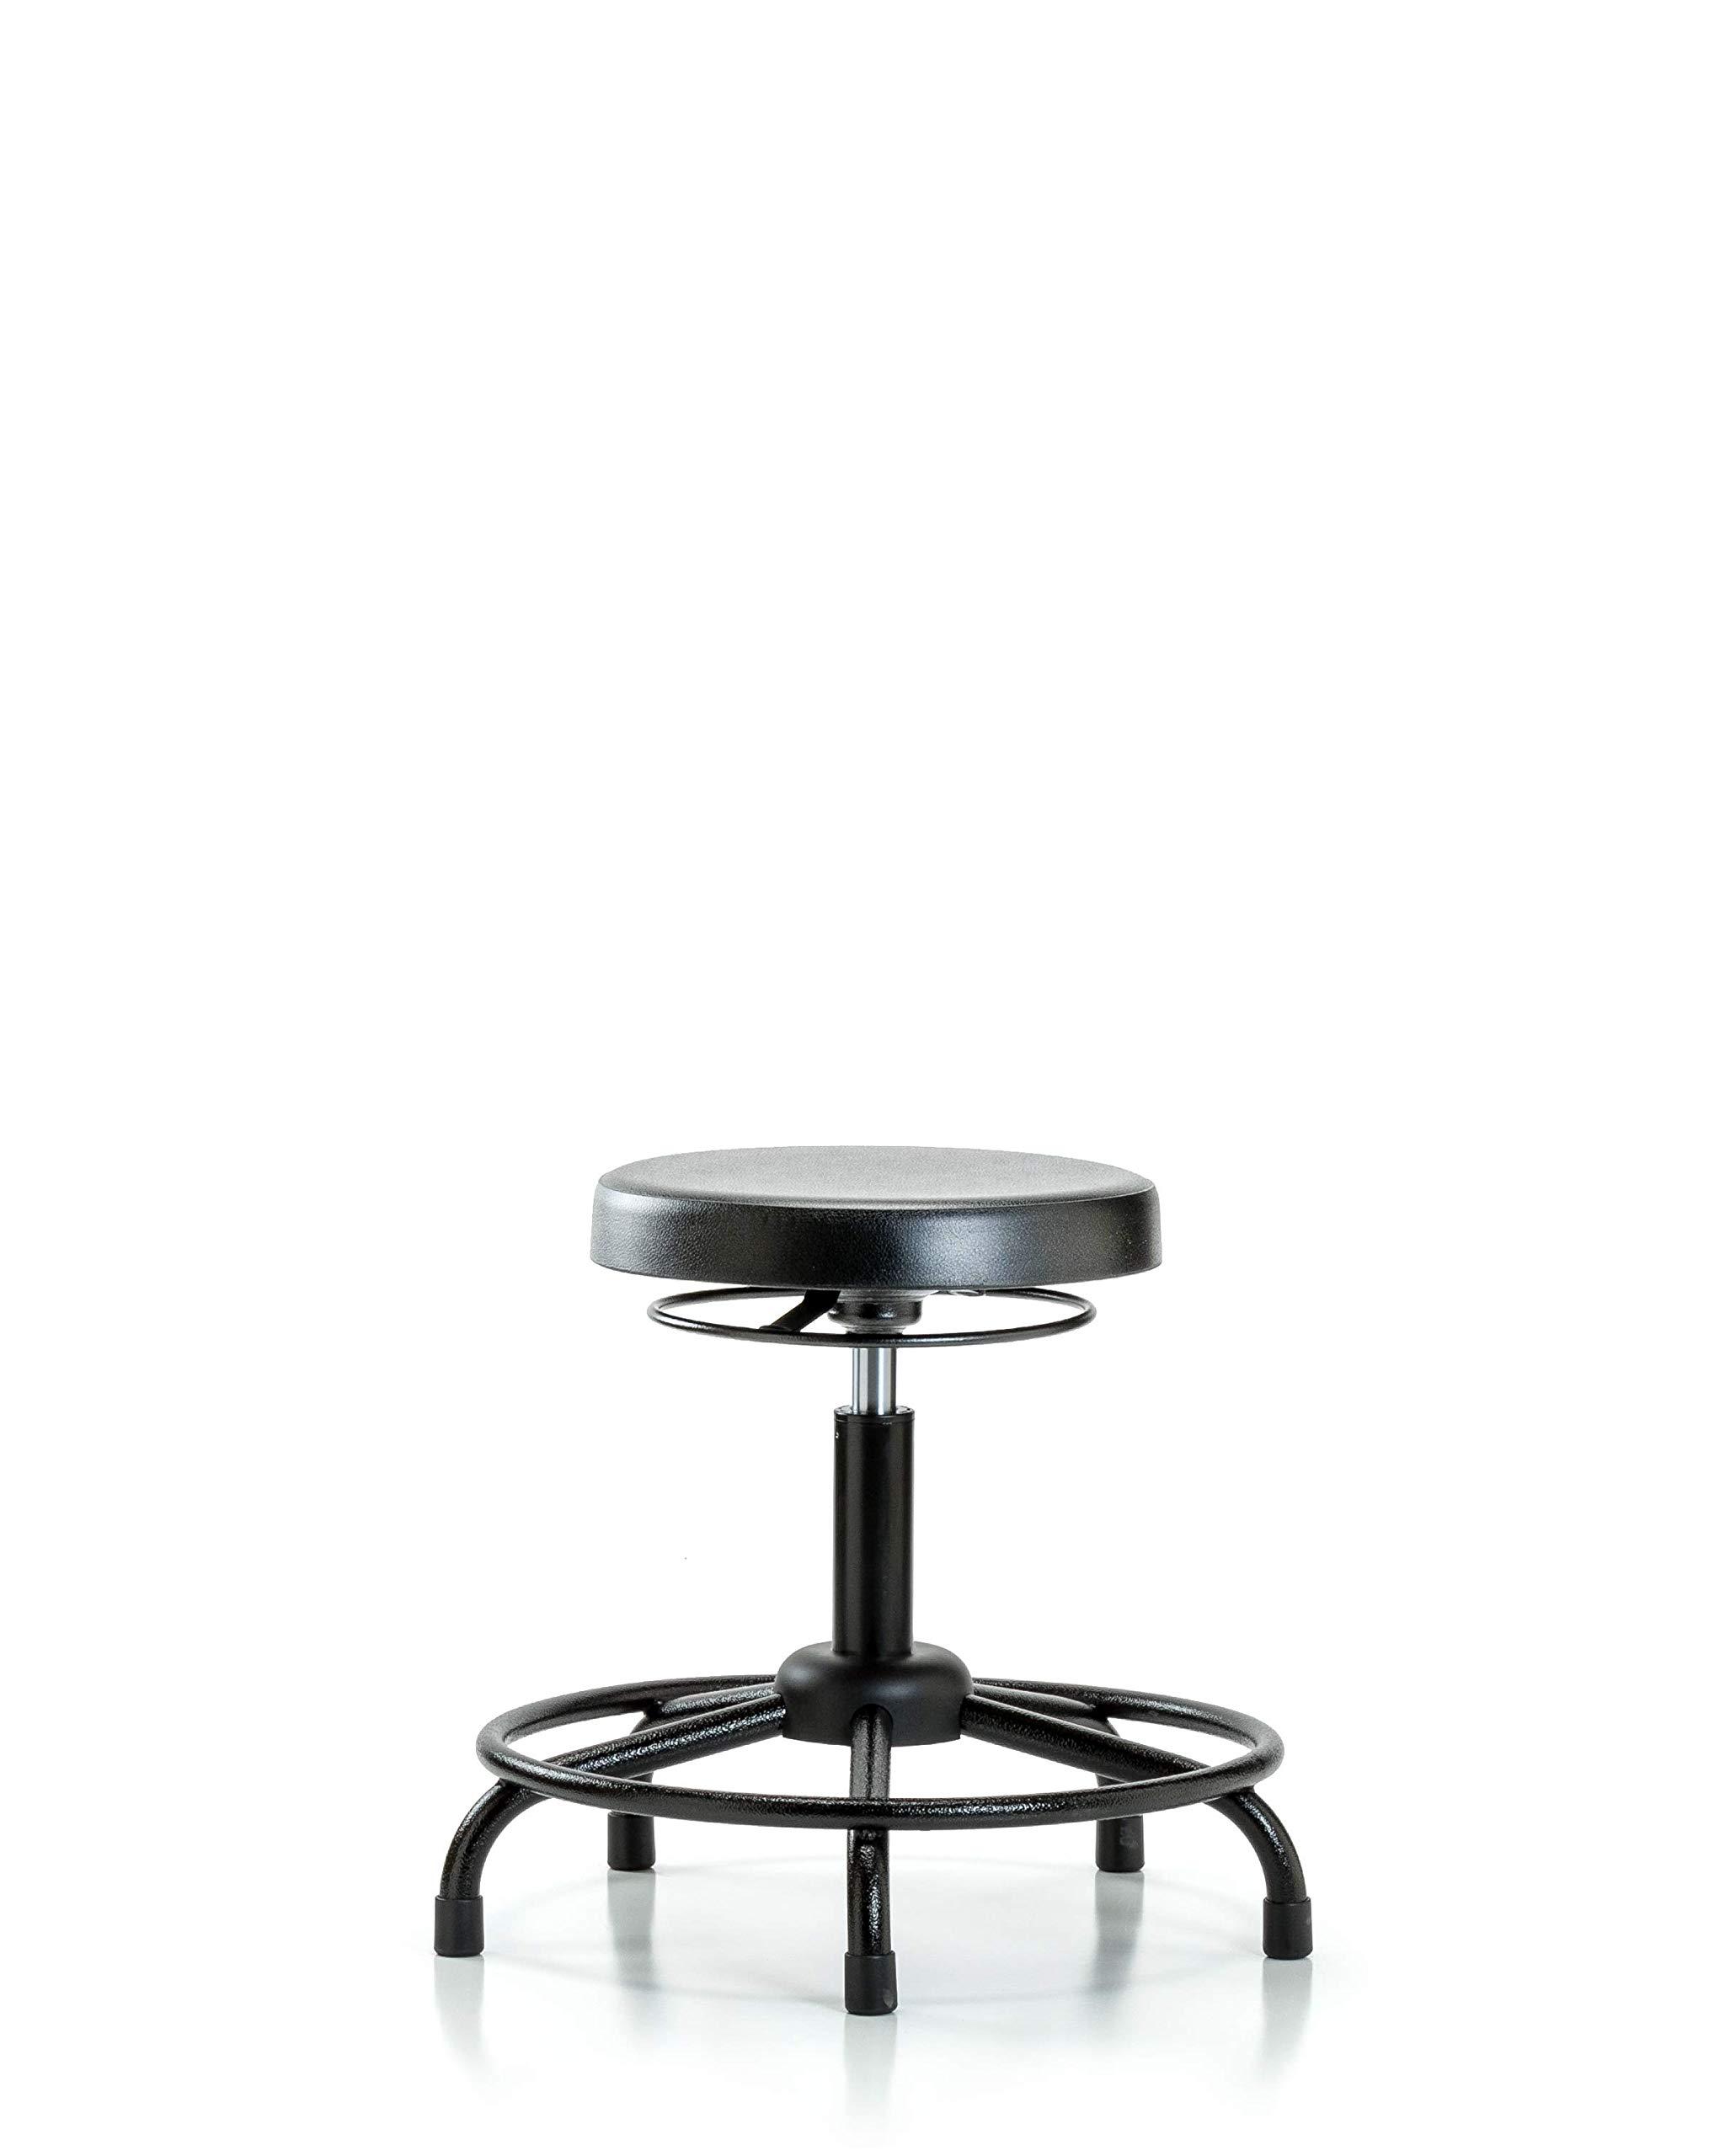 LabTech Seating LT43679 Desk Height Stool, Polyurethane, Round Tube Base - Glides